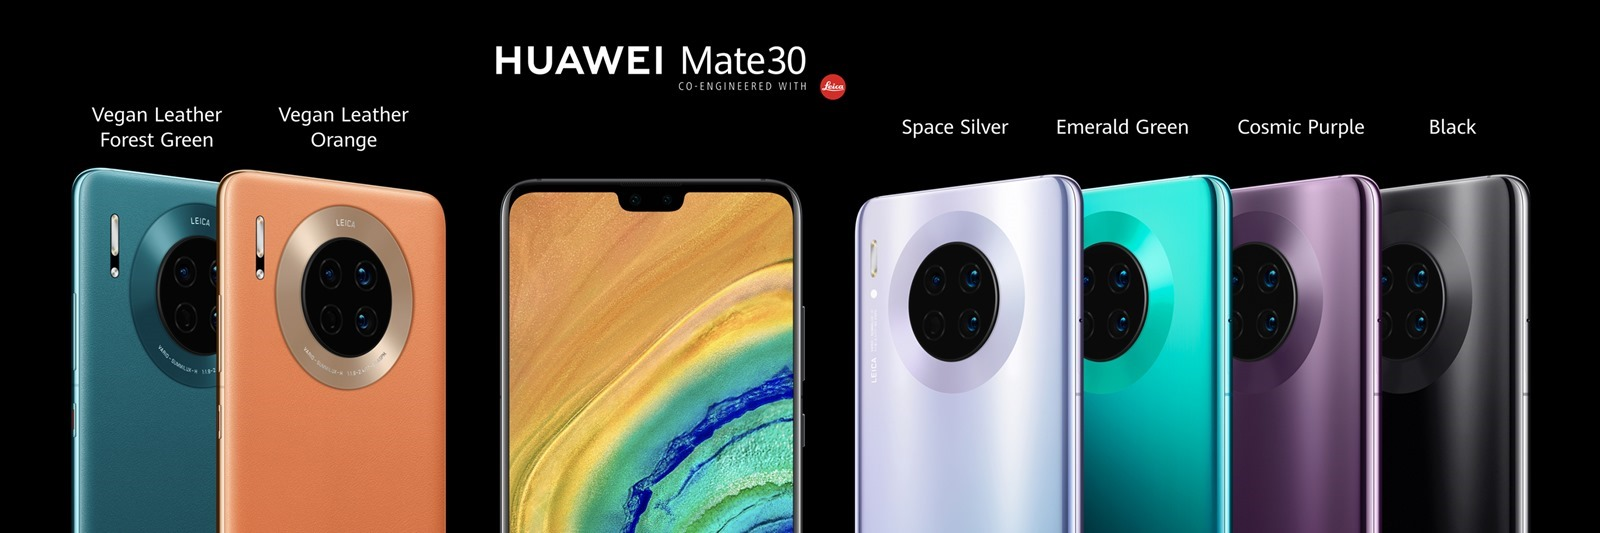 HUAWEI Mate 30 系列全球發佈:手握超級智慧,重構手機想像 @3C 達人廖阿輝